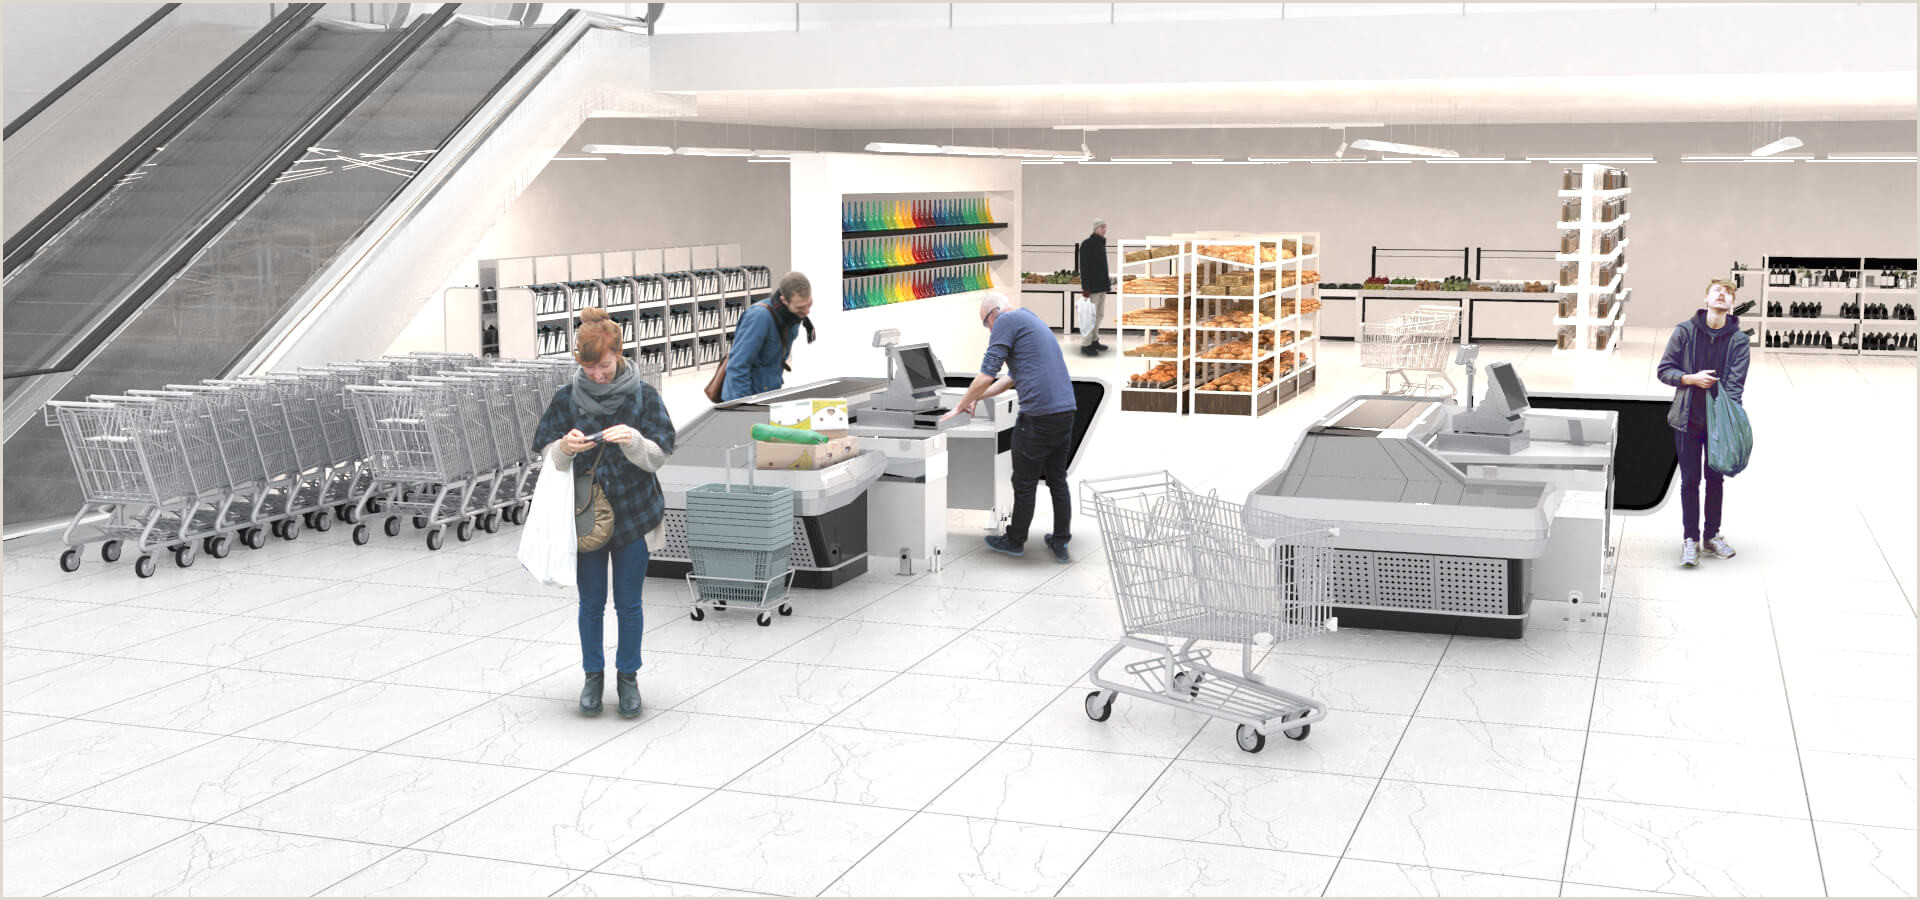 Sistema de Iluminaci³n LINEAL OD 5950 LED para Supermercados